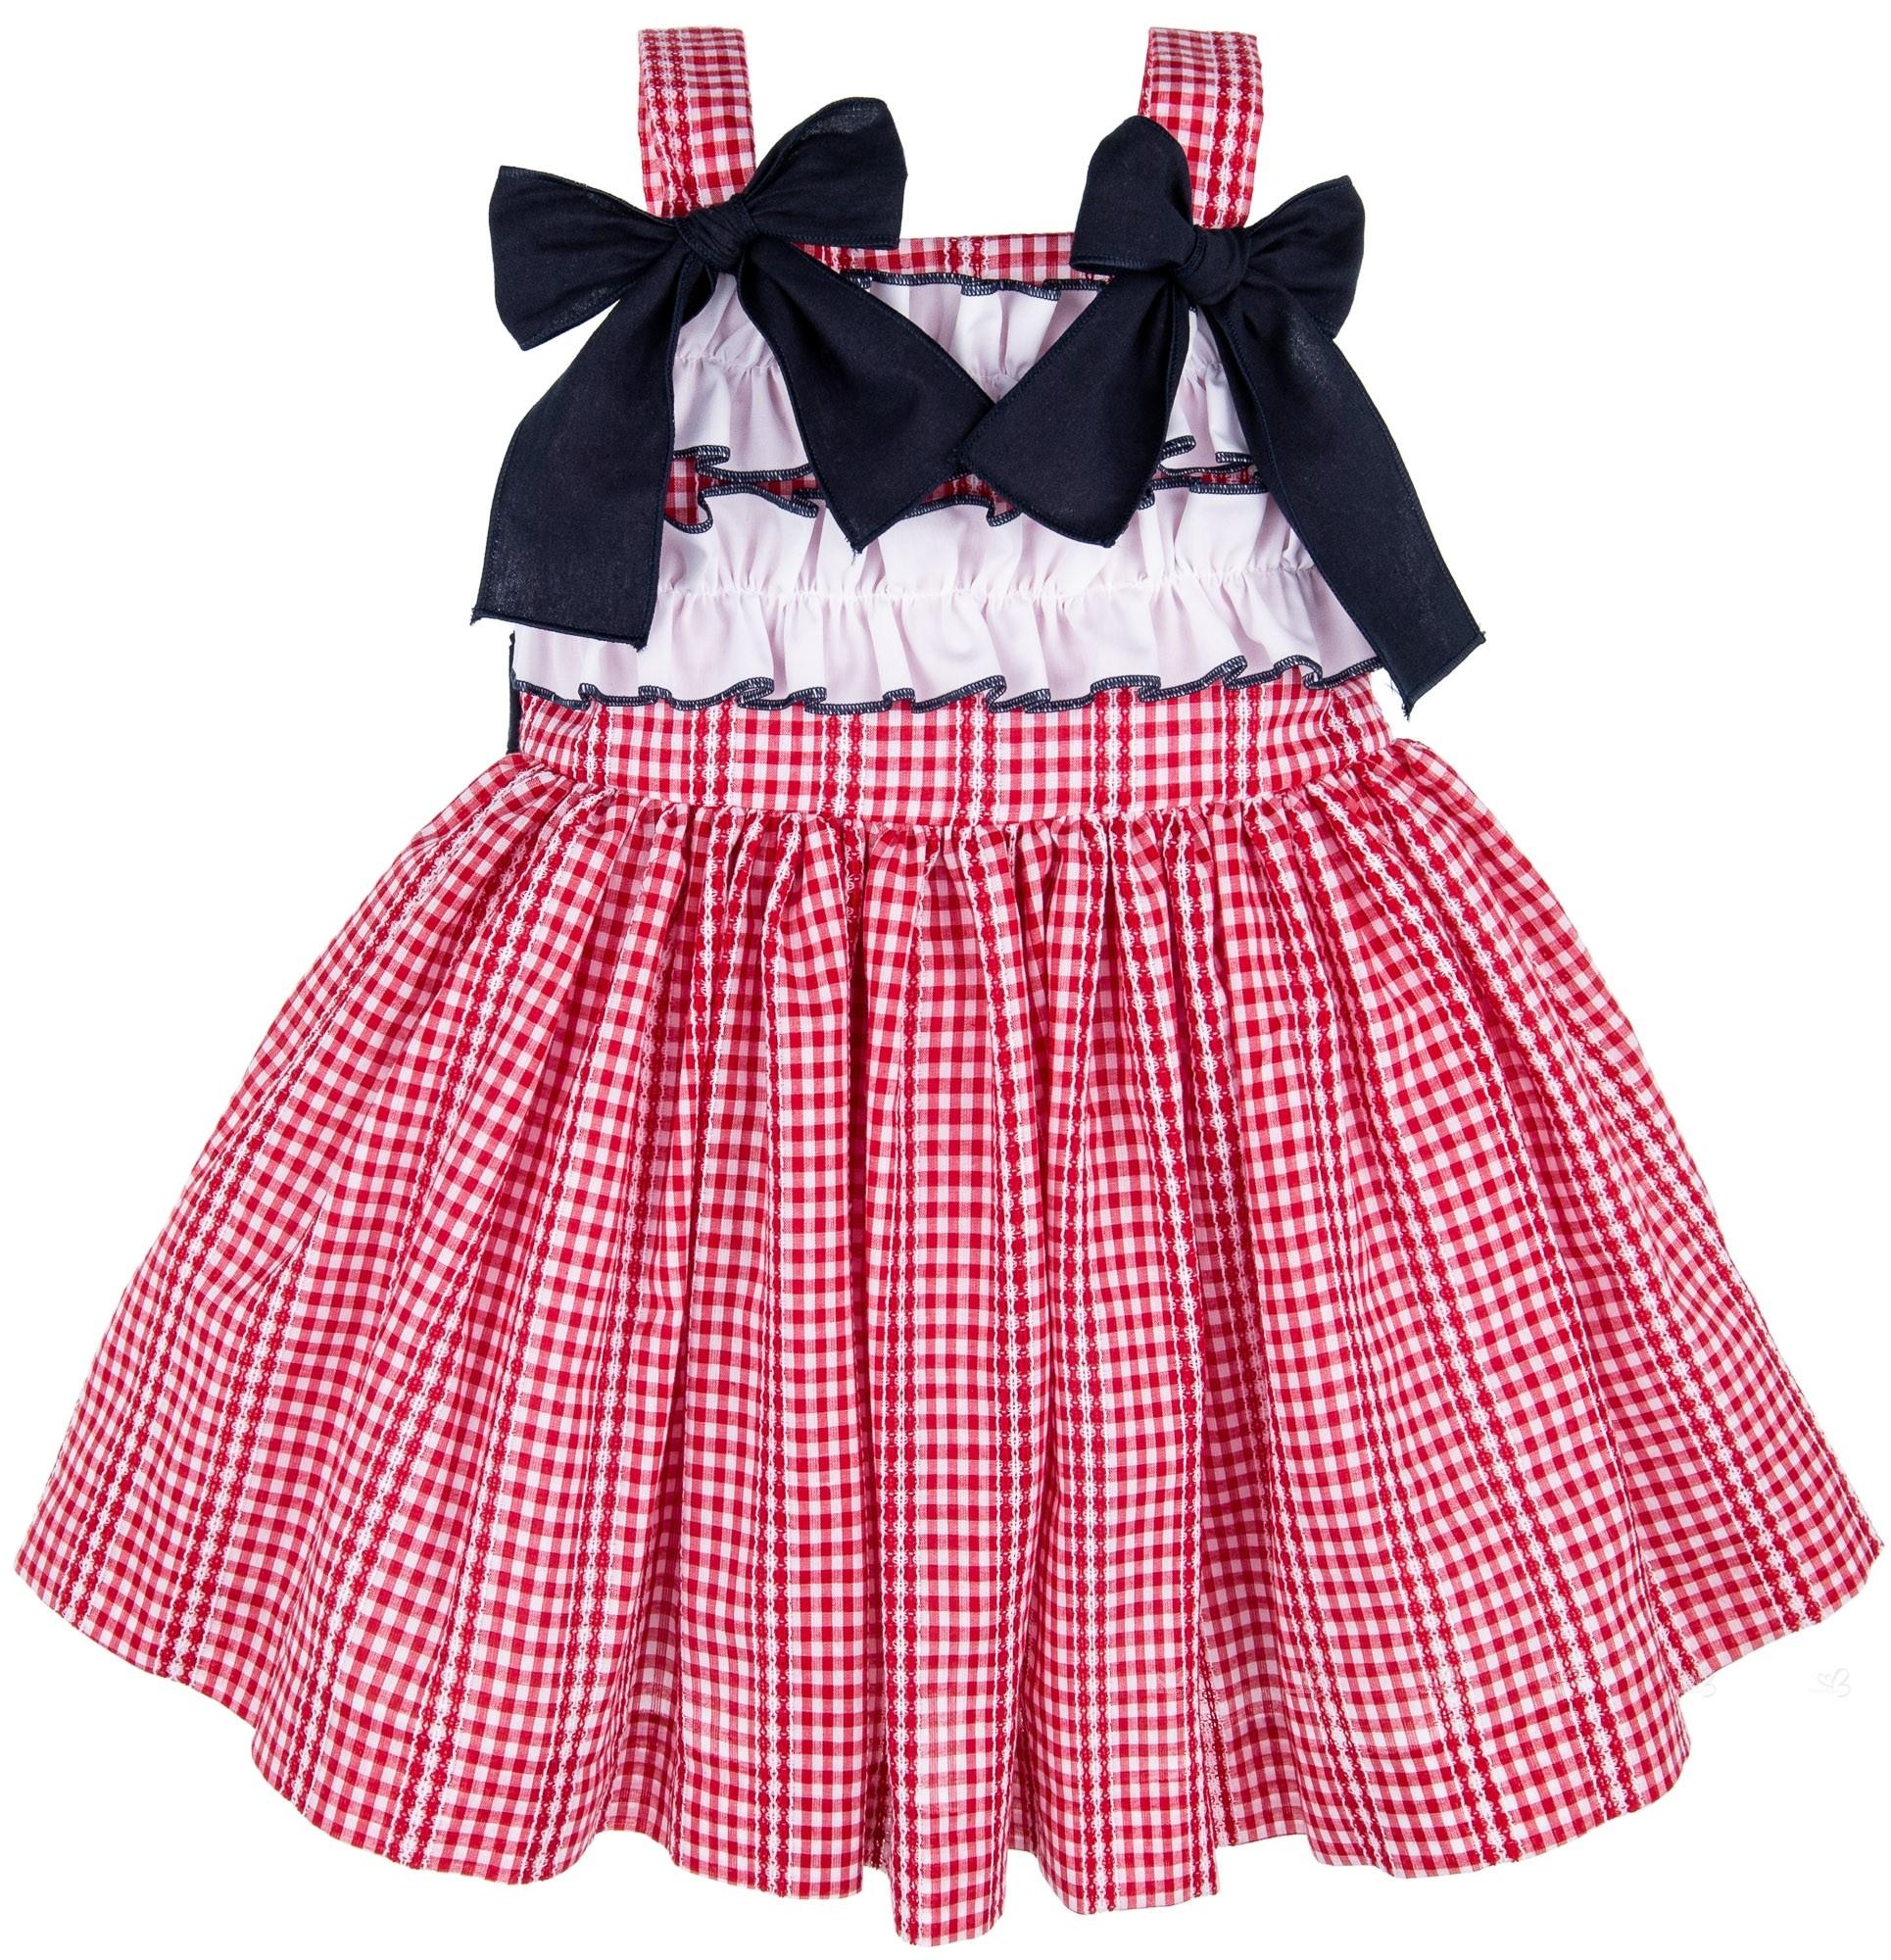 e0ce0fe59d5 Home  Girls Red Gingham Dress   White Ruffles. Lappepa Moda Infantil  Vestido Niña Vichy Rojo   Volantes Fruncidos en Blanco ...